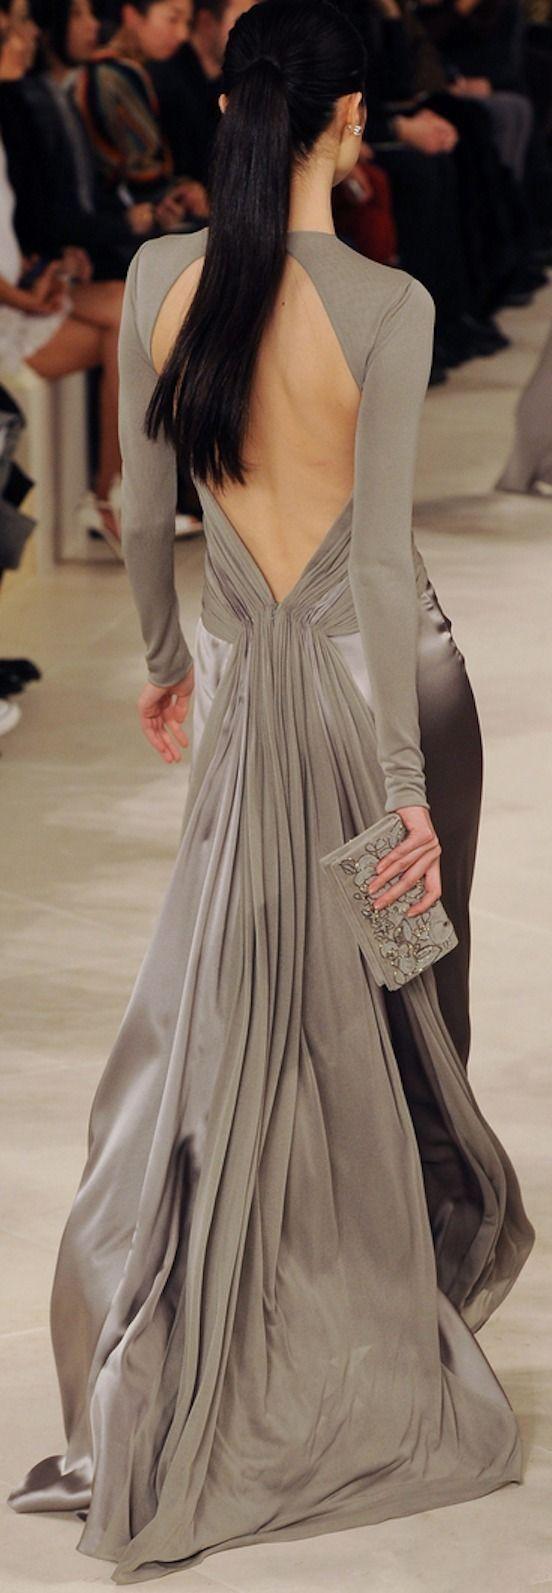 moda goodliness #dresses #luxury 2017 #cute designer vestido vestidos de 2018: